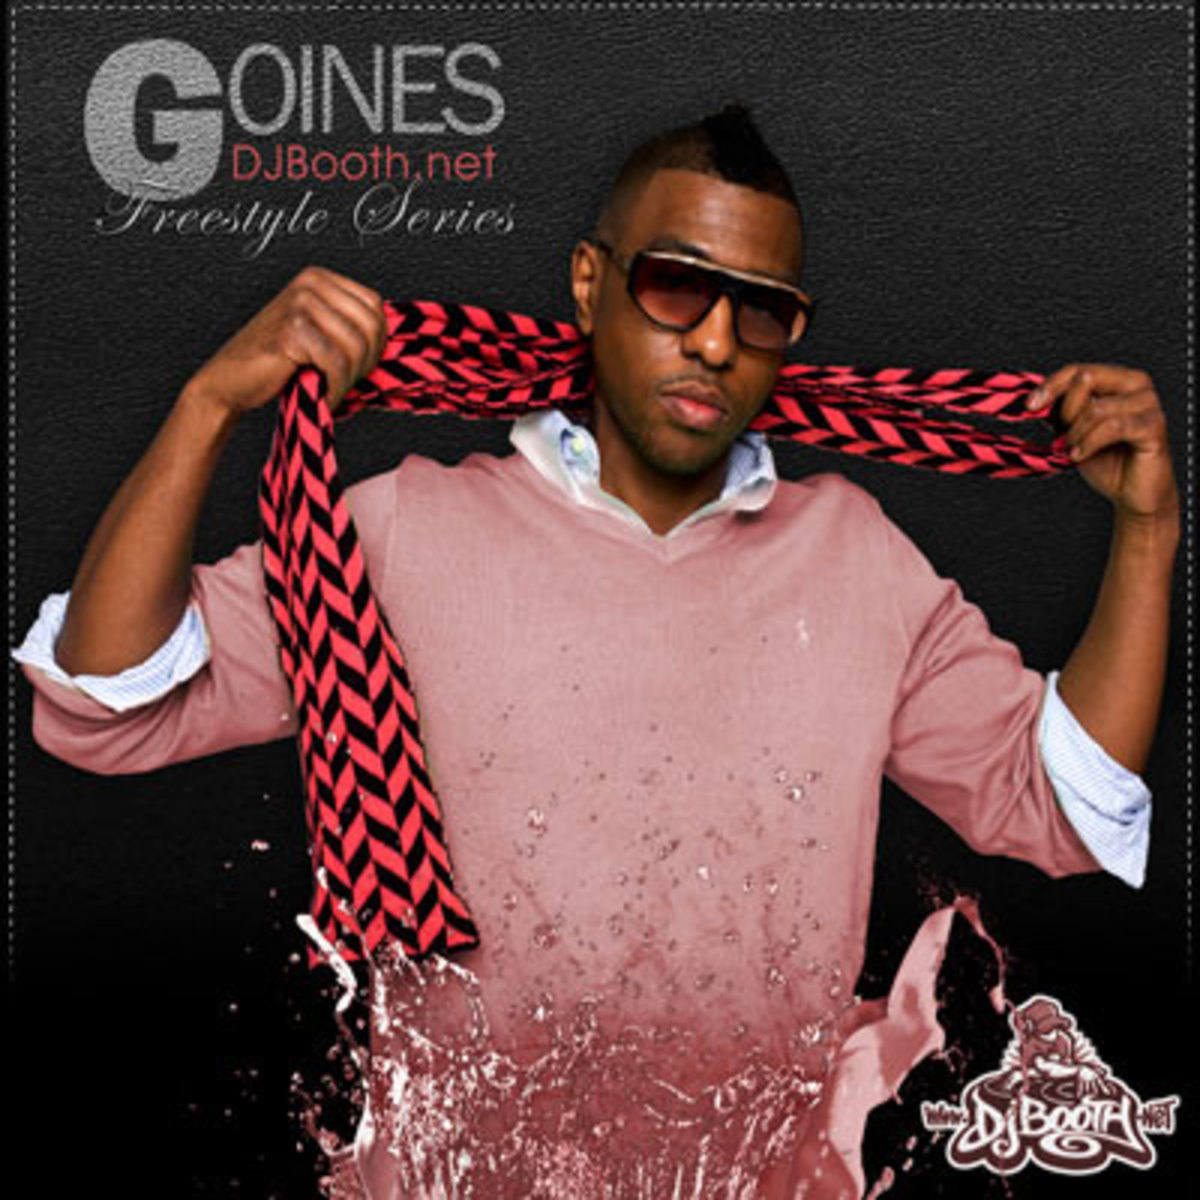 goines-freestyle.jpg